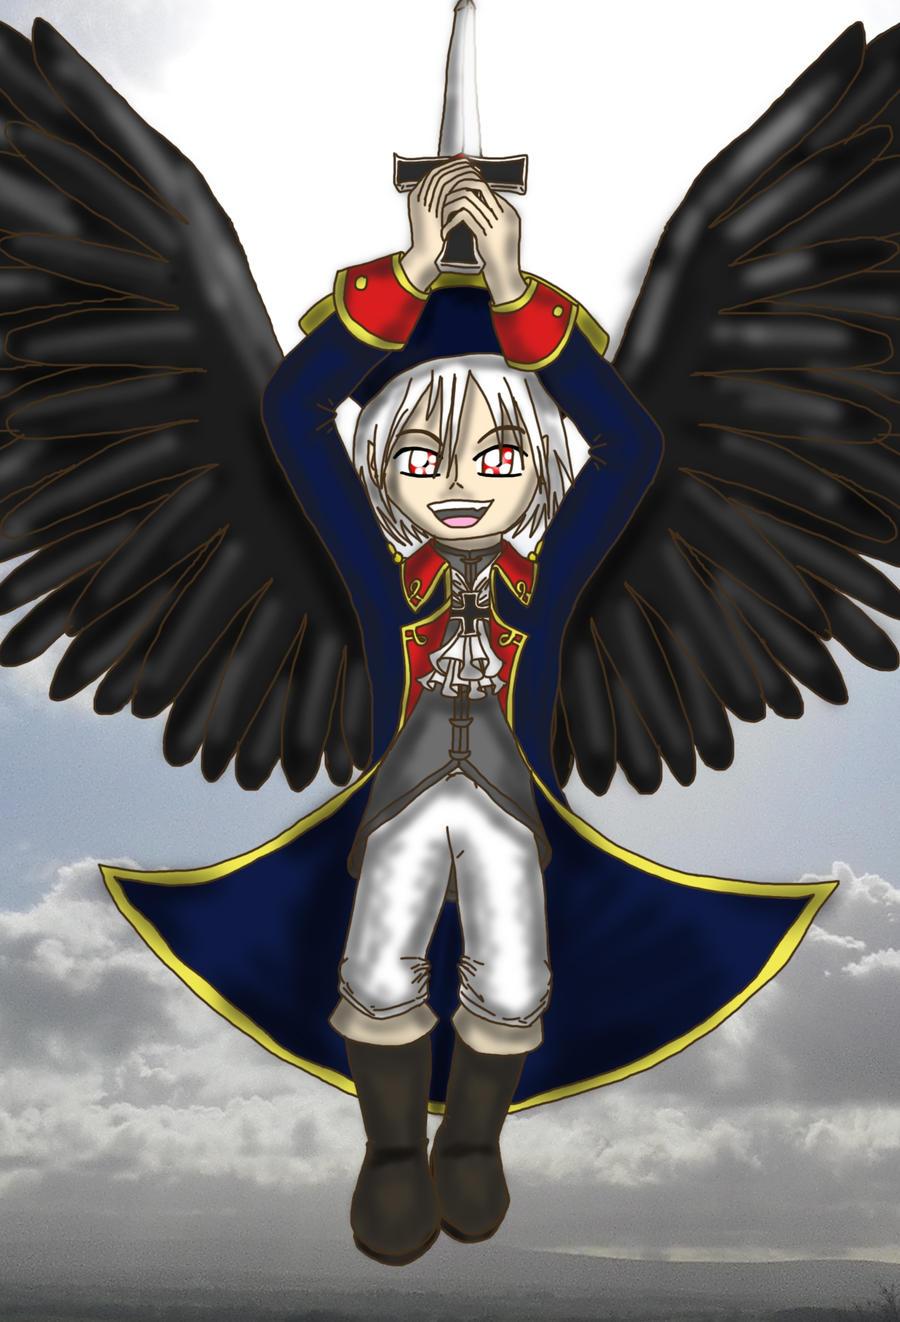 Mein Gott by lillilotus